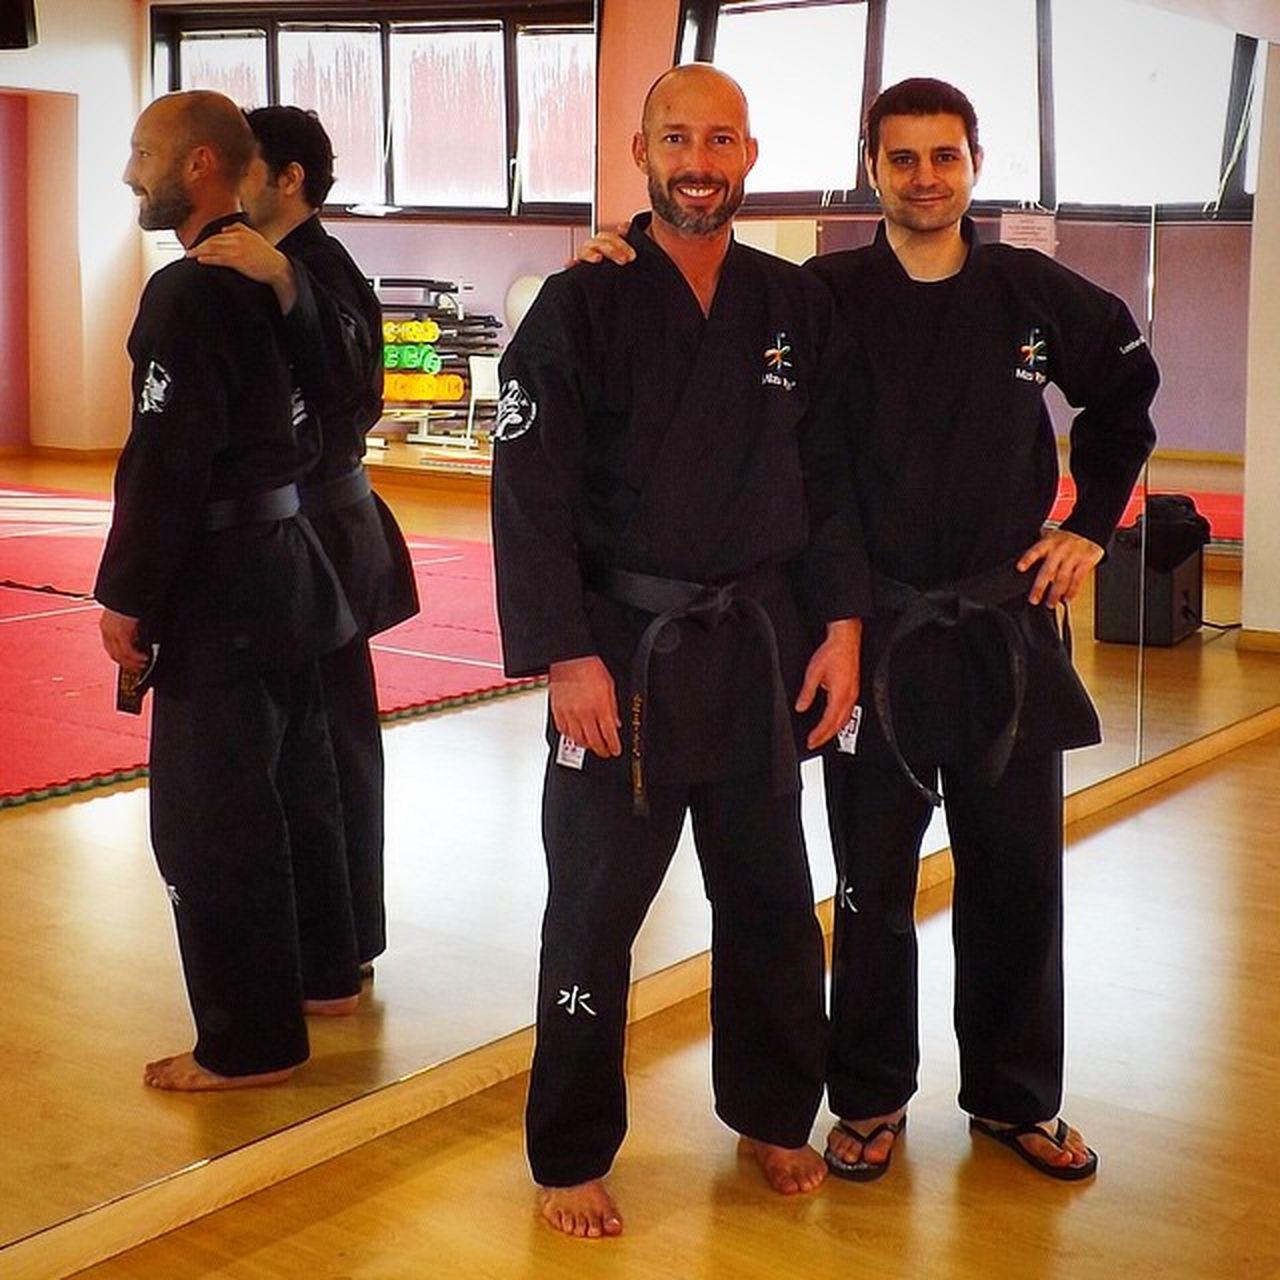 Stage Bamboo Fitness Luca Matteo  Jujitsu Mizuryu Karatejitsu Cosimocosta Levaamansolfianco Finalmenteunafotoassieme